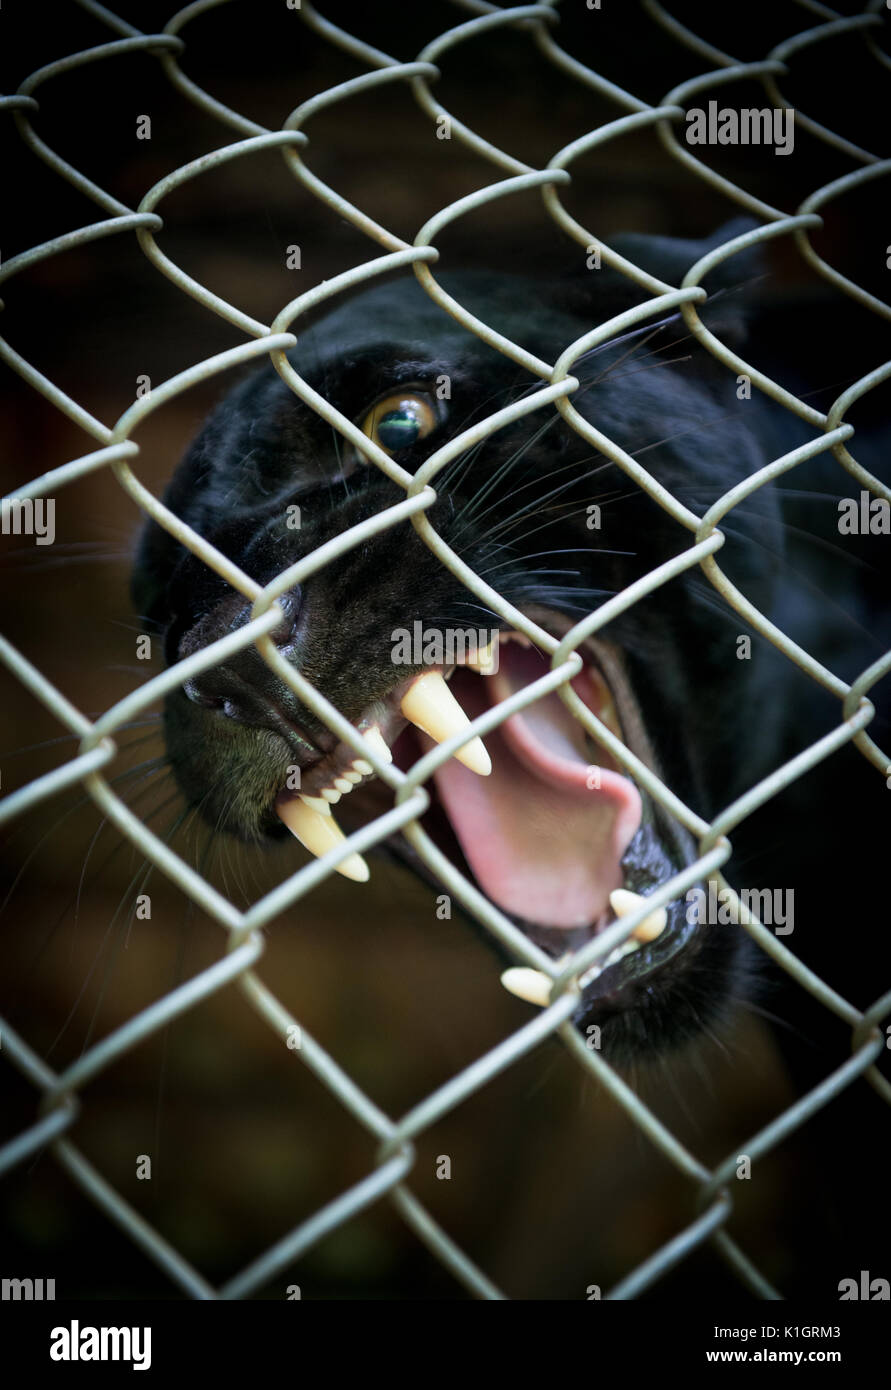 An angry Black Jaguar snarling inside an enclosure - Stock Image